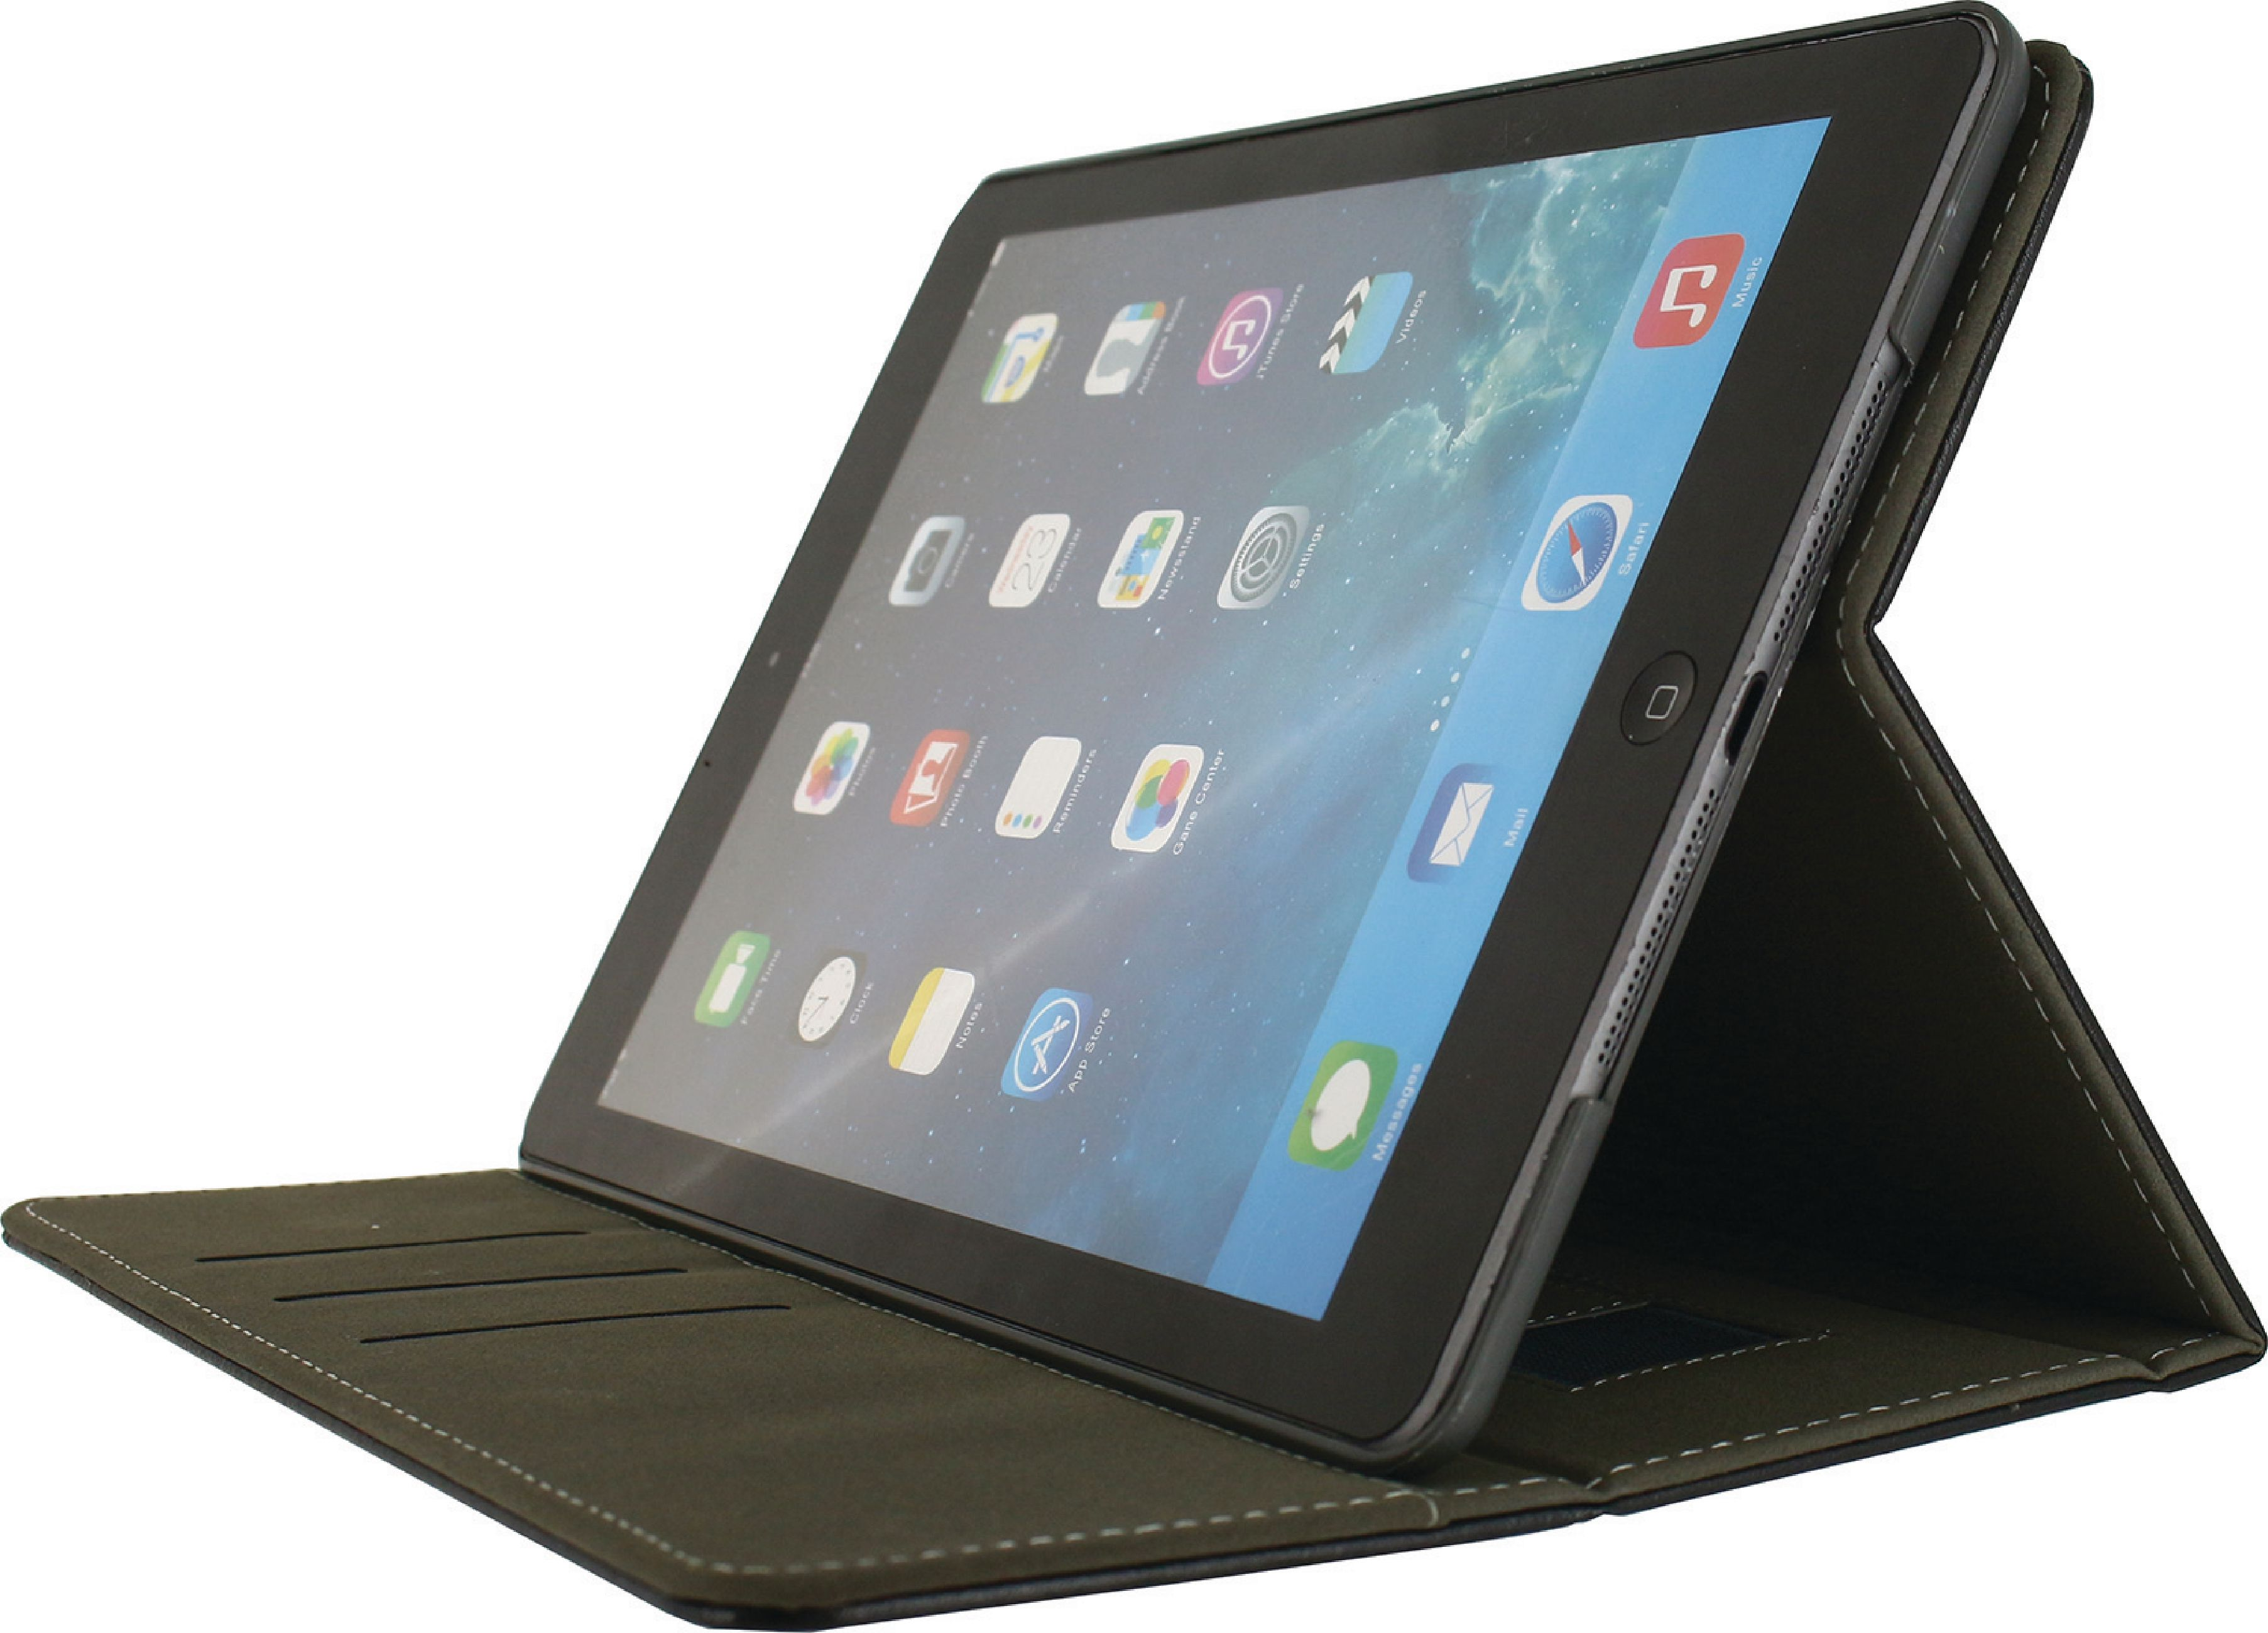 Billede af Tablet Premium Folieetui Apple iPad Air 2 Sort